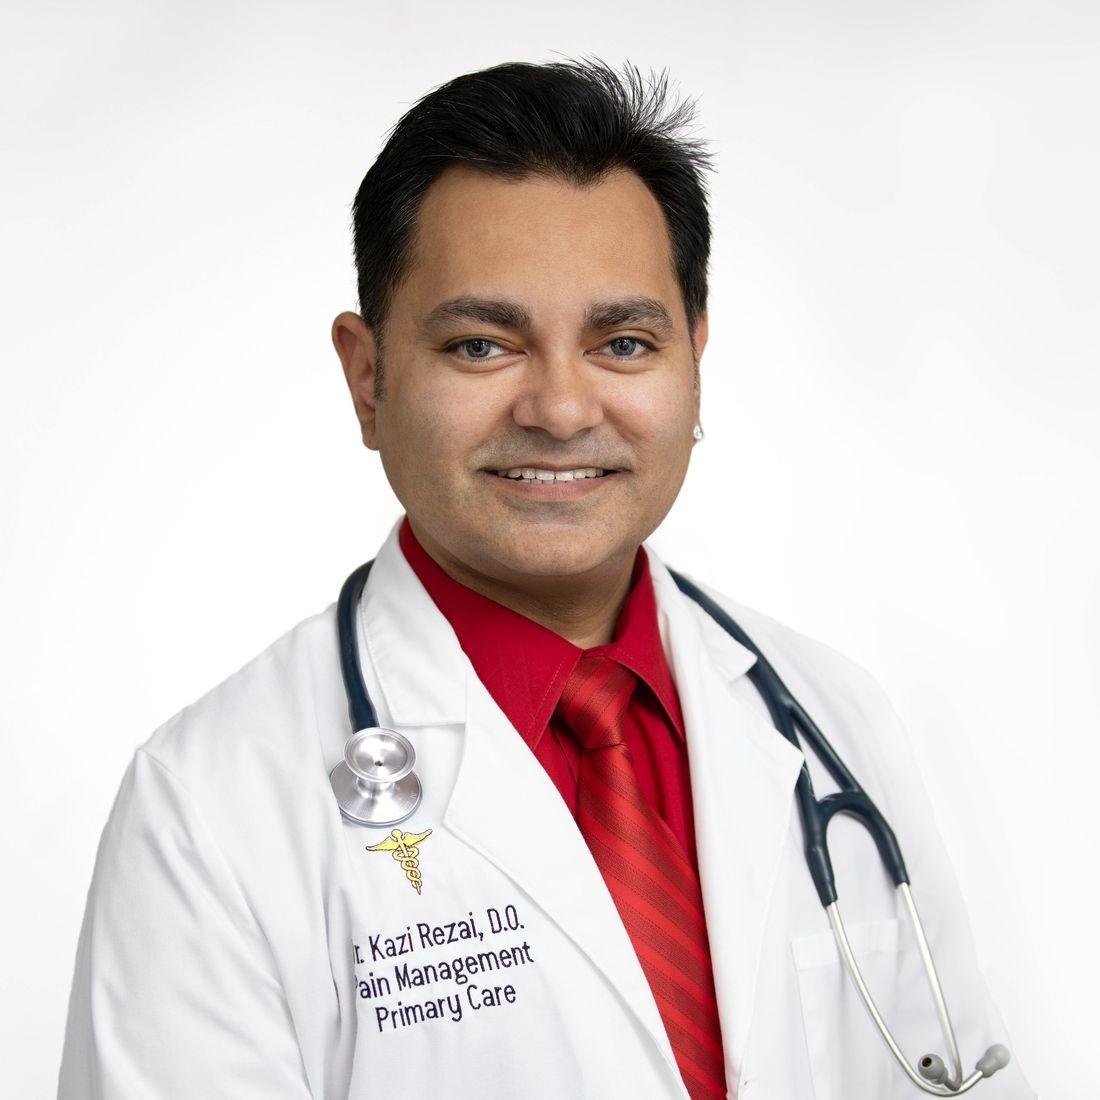 Dr. Kazi Rezai